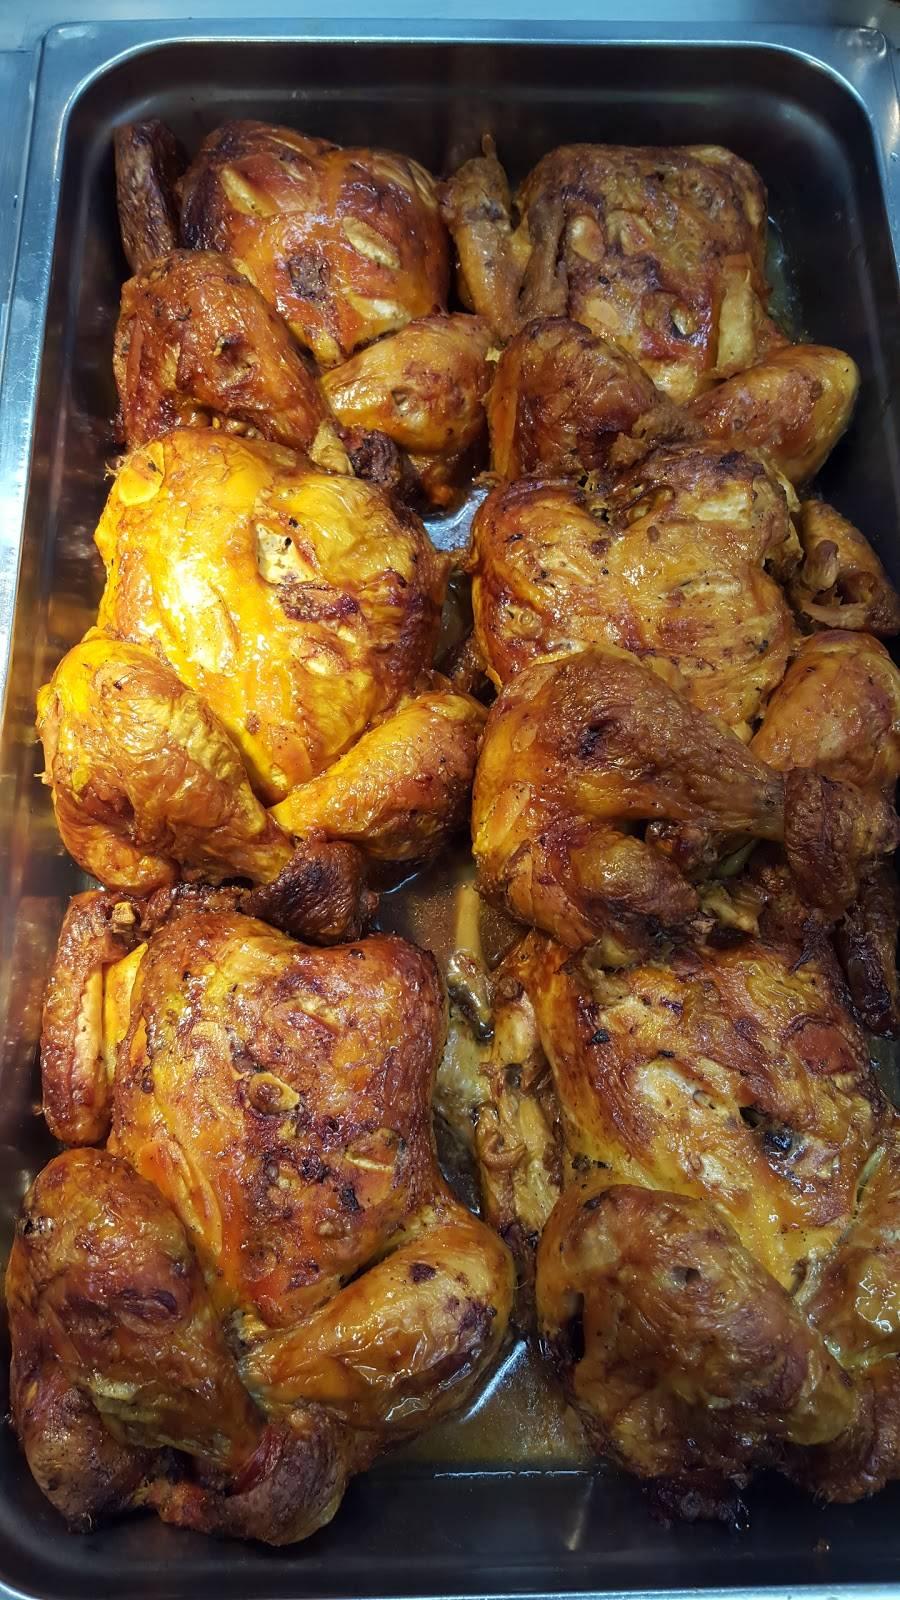 Chris 1 Flavor | restaurant | 115-15 Liberty Ave, South Richmond Hill, NY 11419, USA | 7185293449 OR +1 718-529-3449